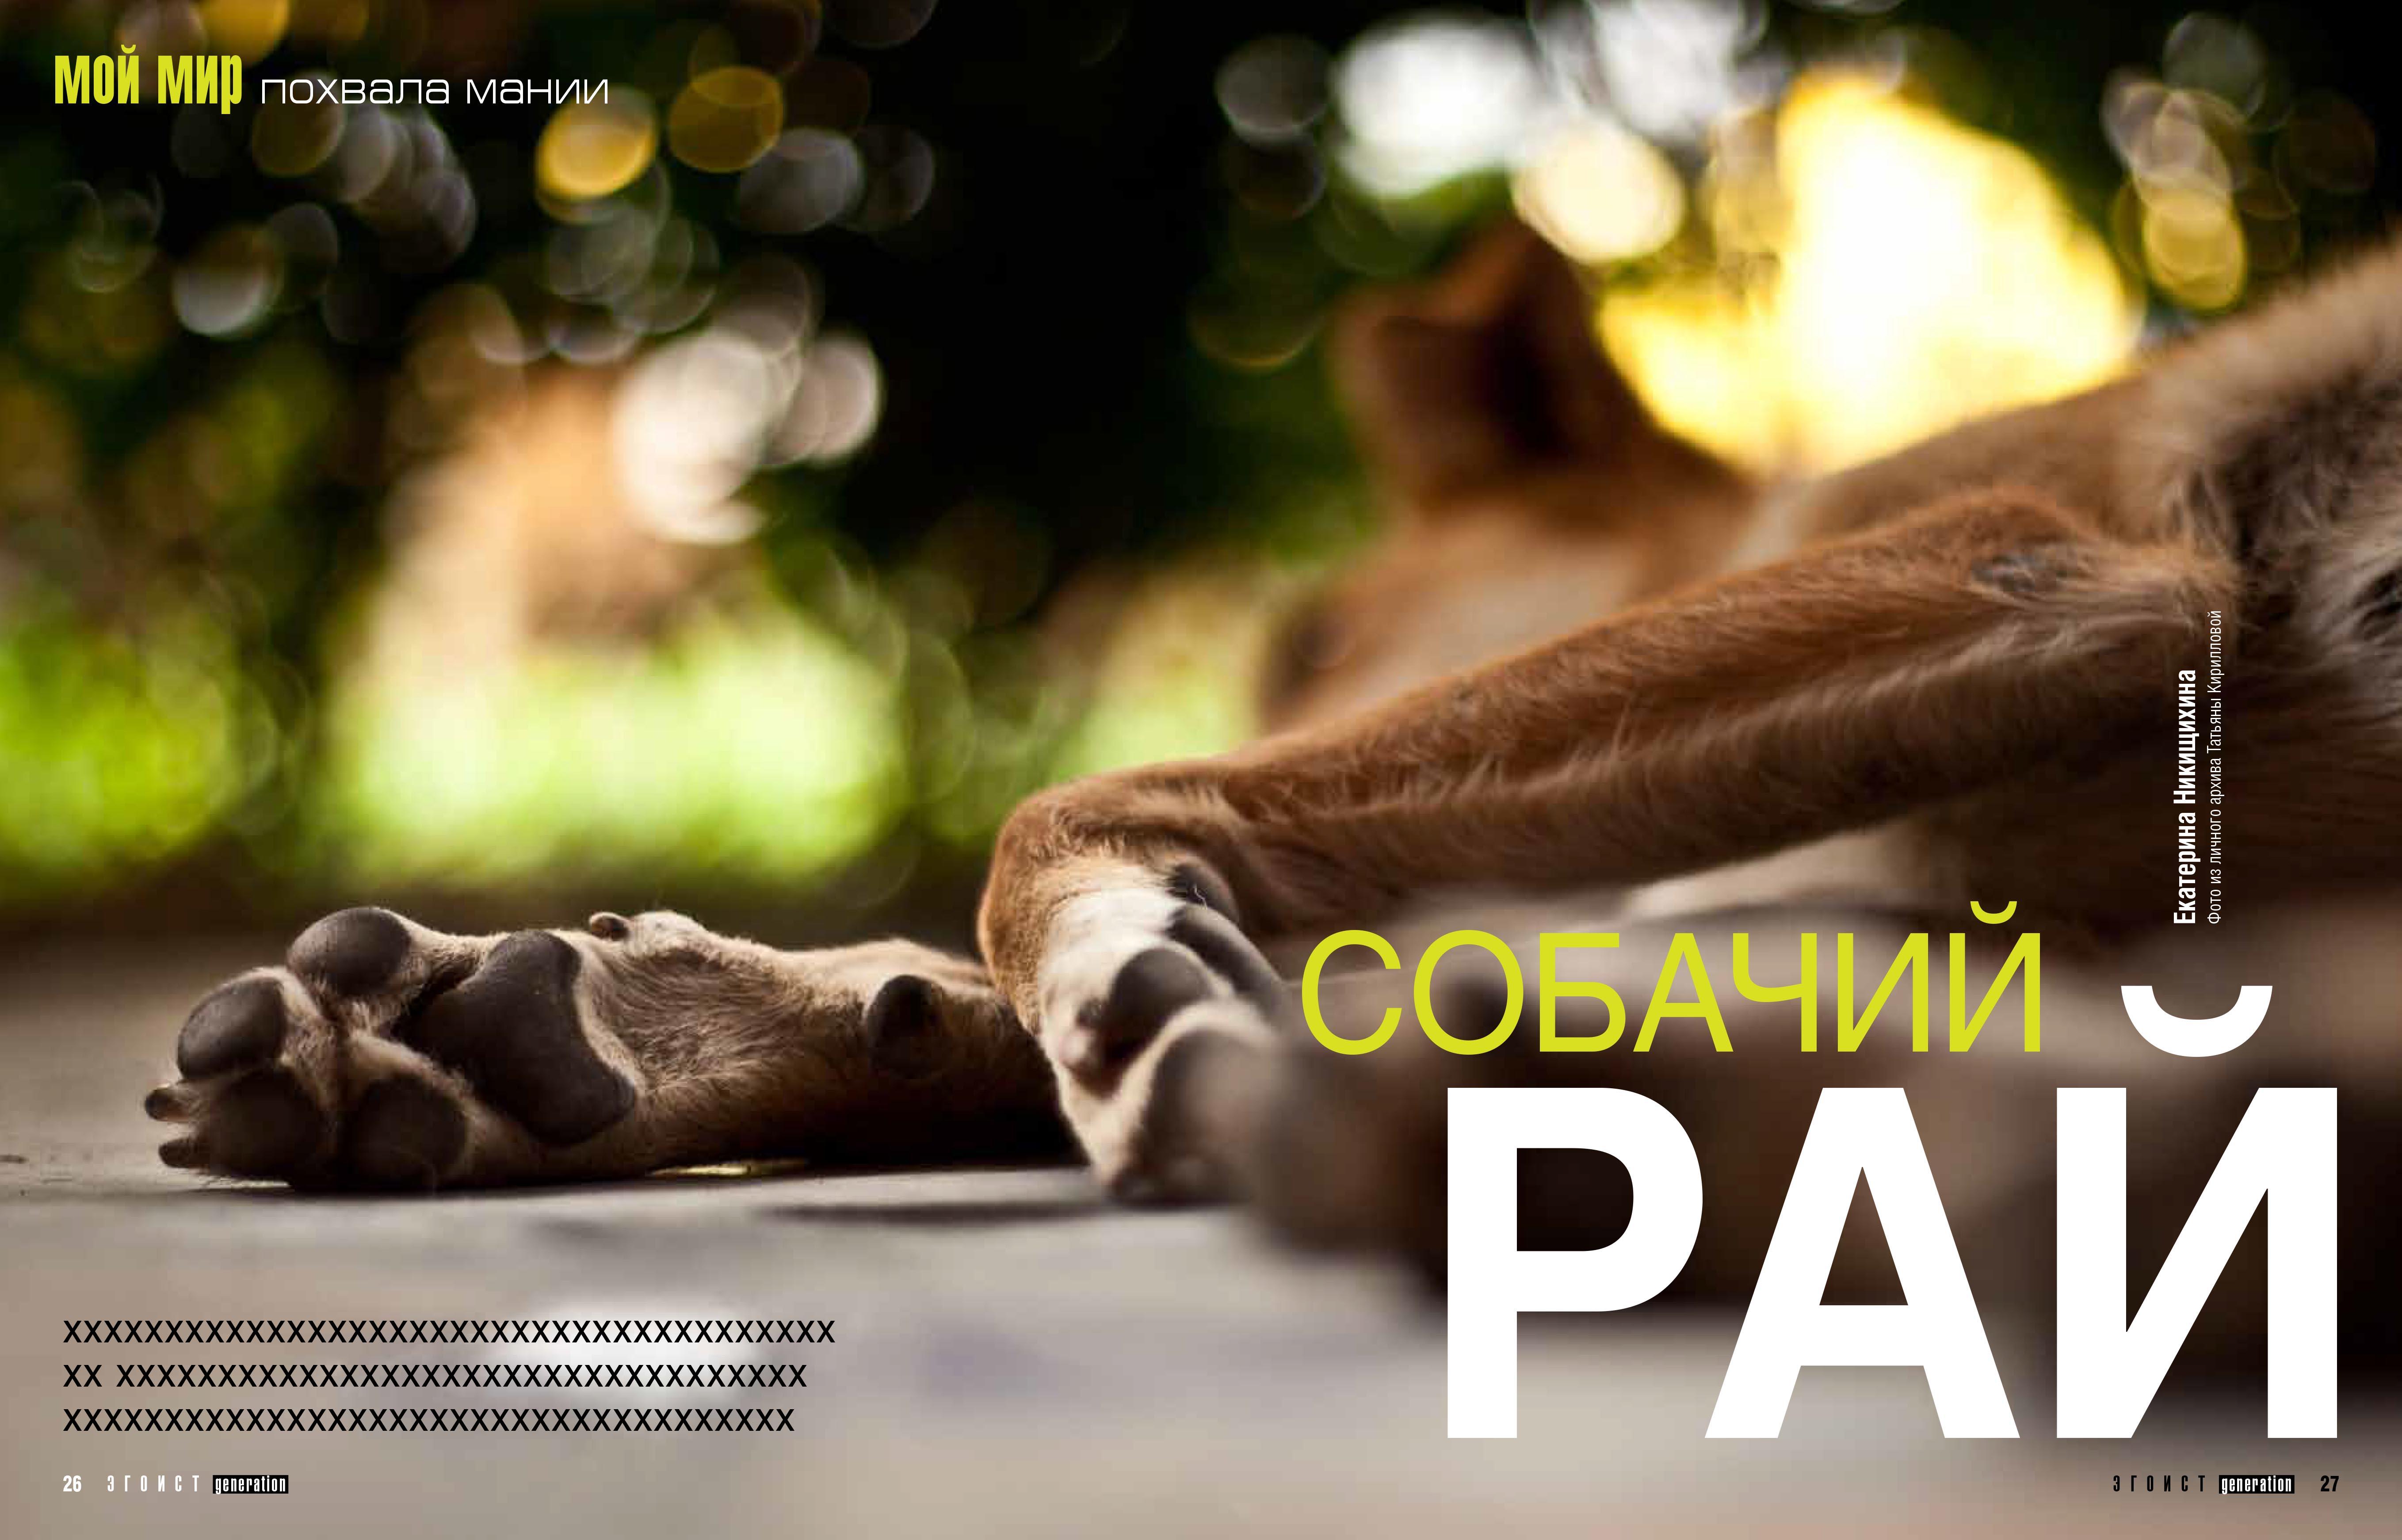 Собака Бода (1)21